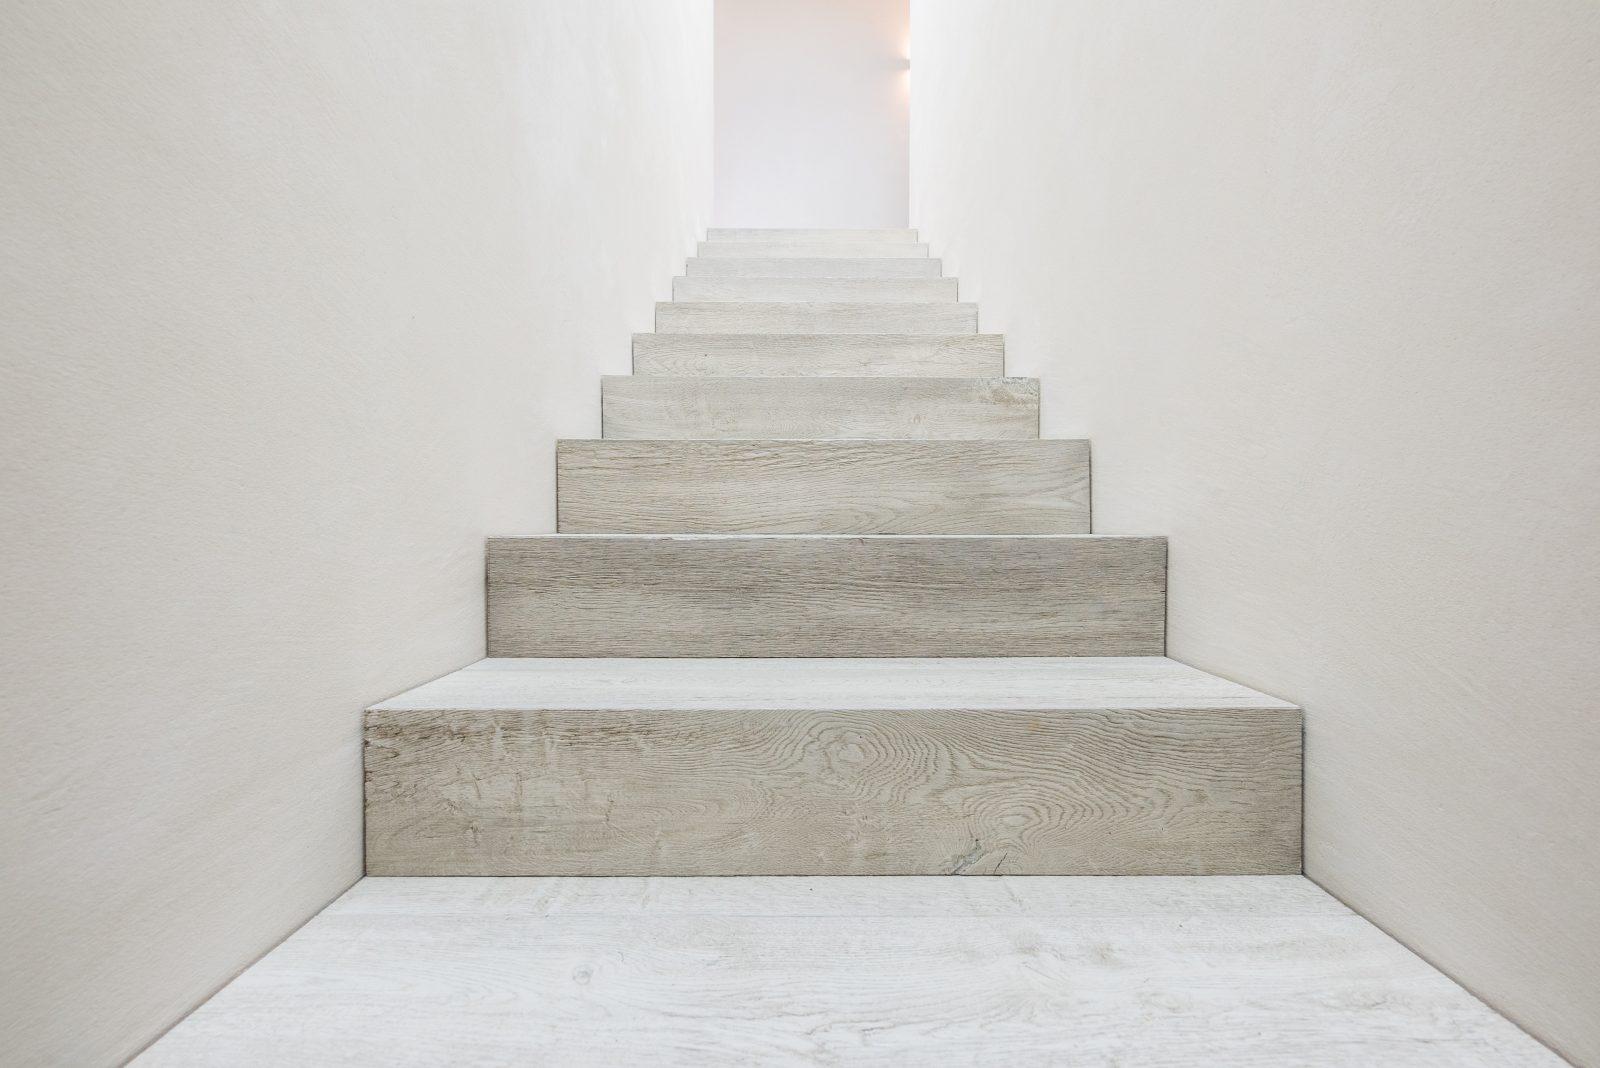 residenza-privata-boffi-studio-frauenfeld-ph-balz-kubli-3